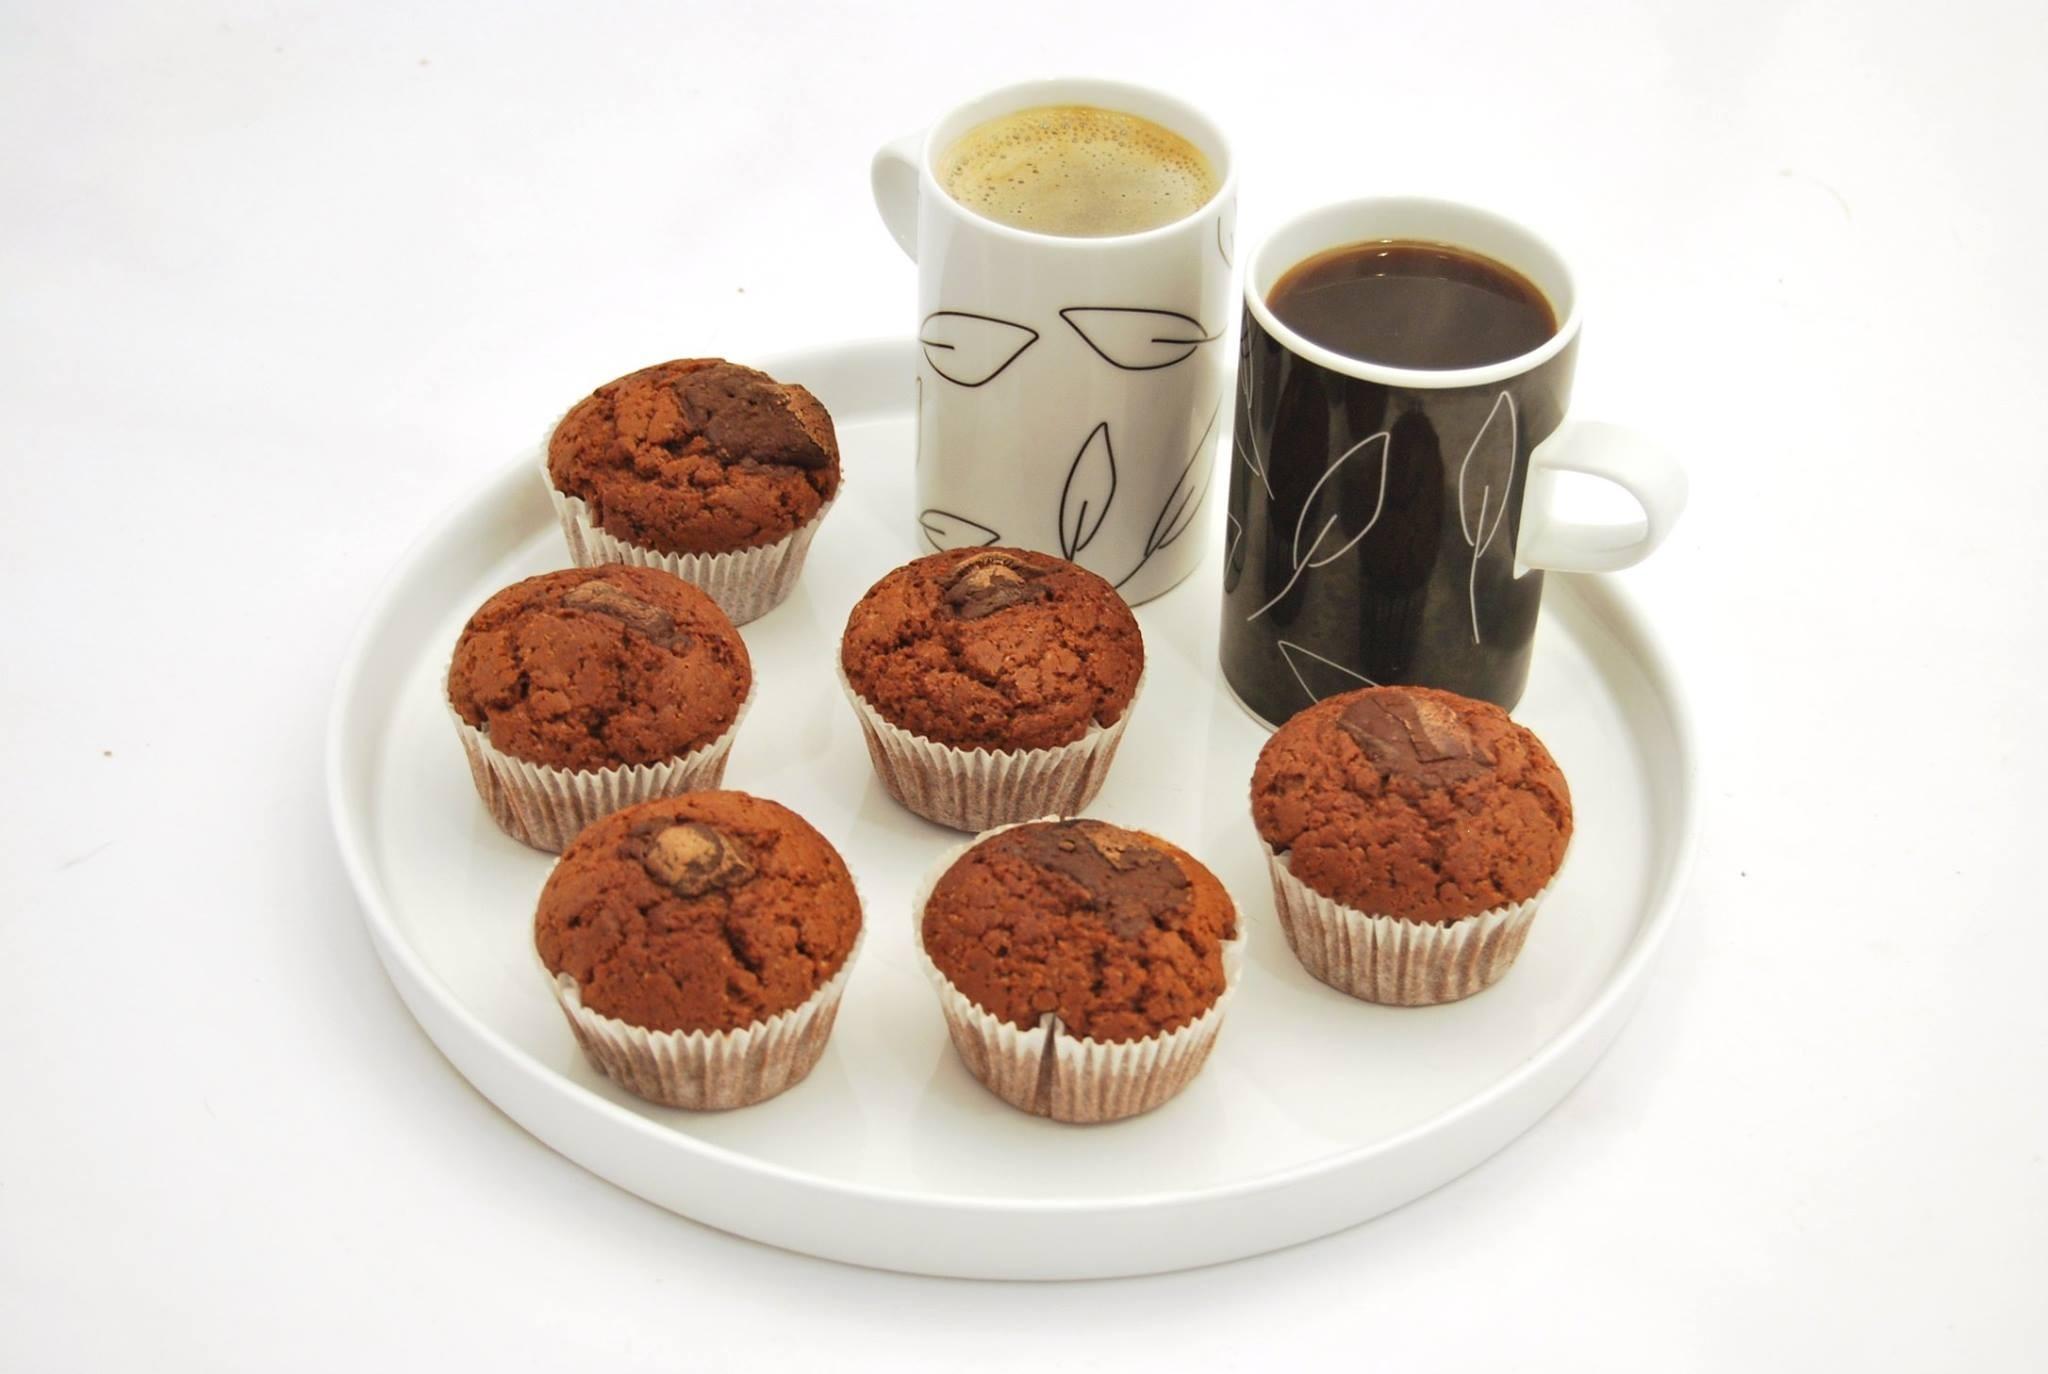 Aler mufiiny kakaové s kúskami čokolády